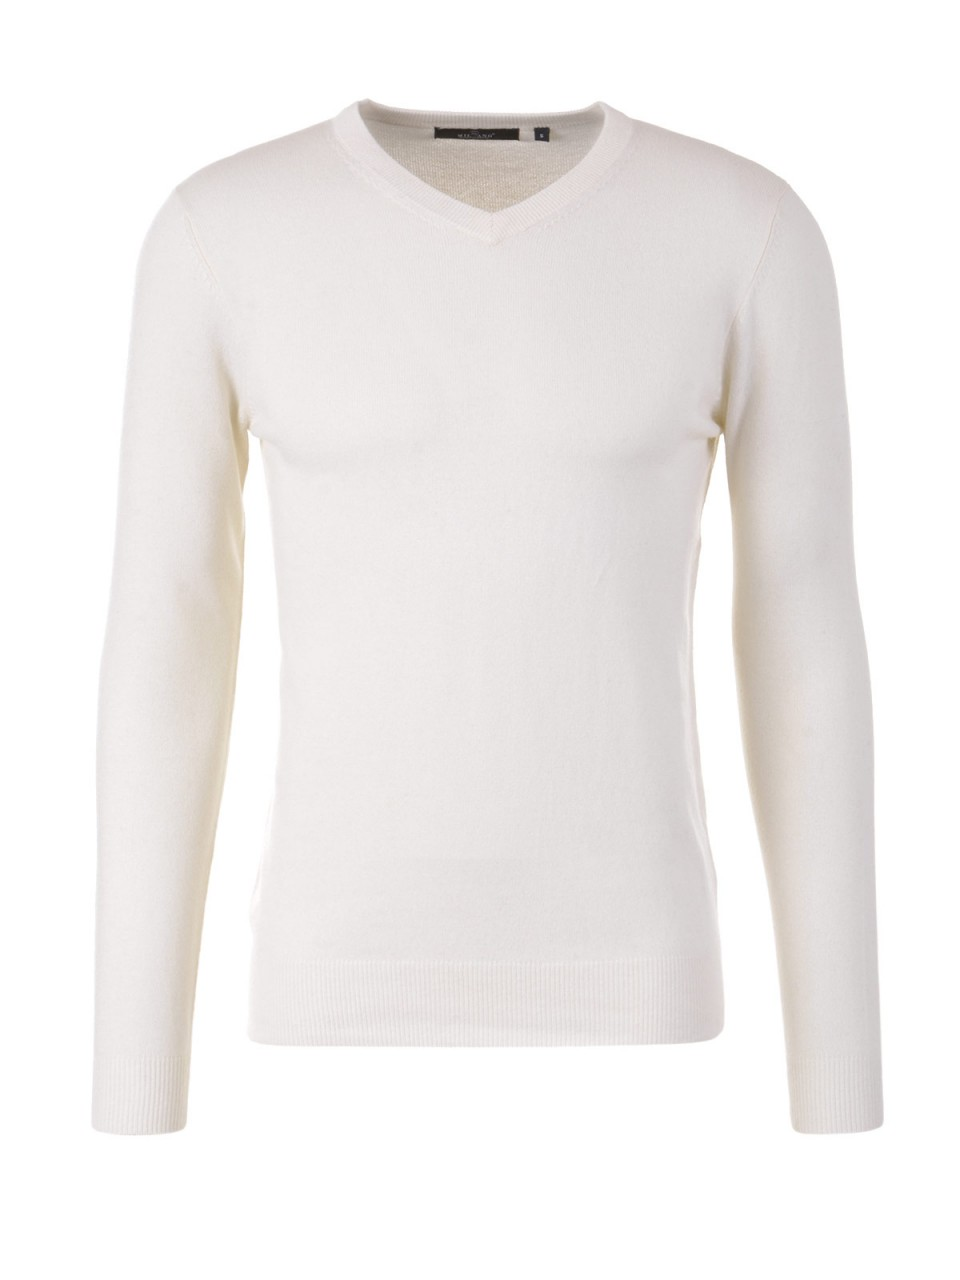 milano-italy-herren-pullover-creme, 34.98 EUR @ designermode-com-mode